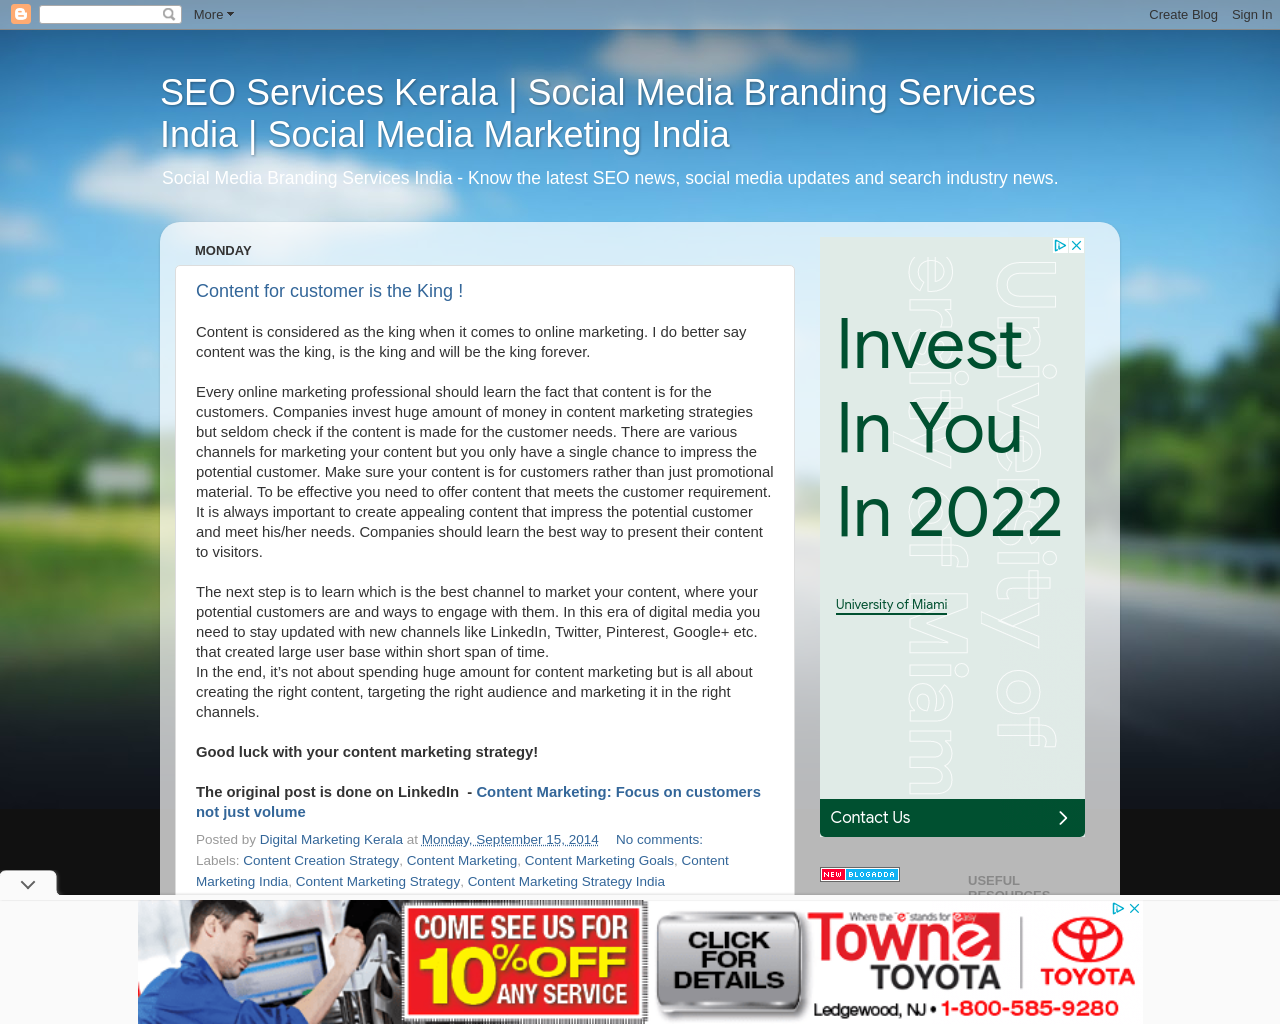 SEO Services Kerala